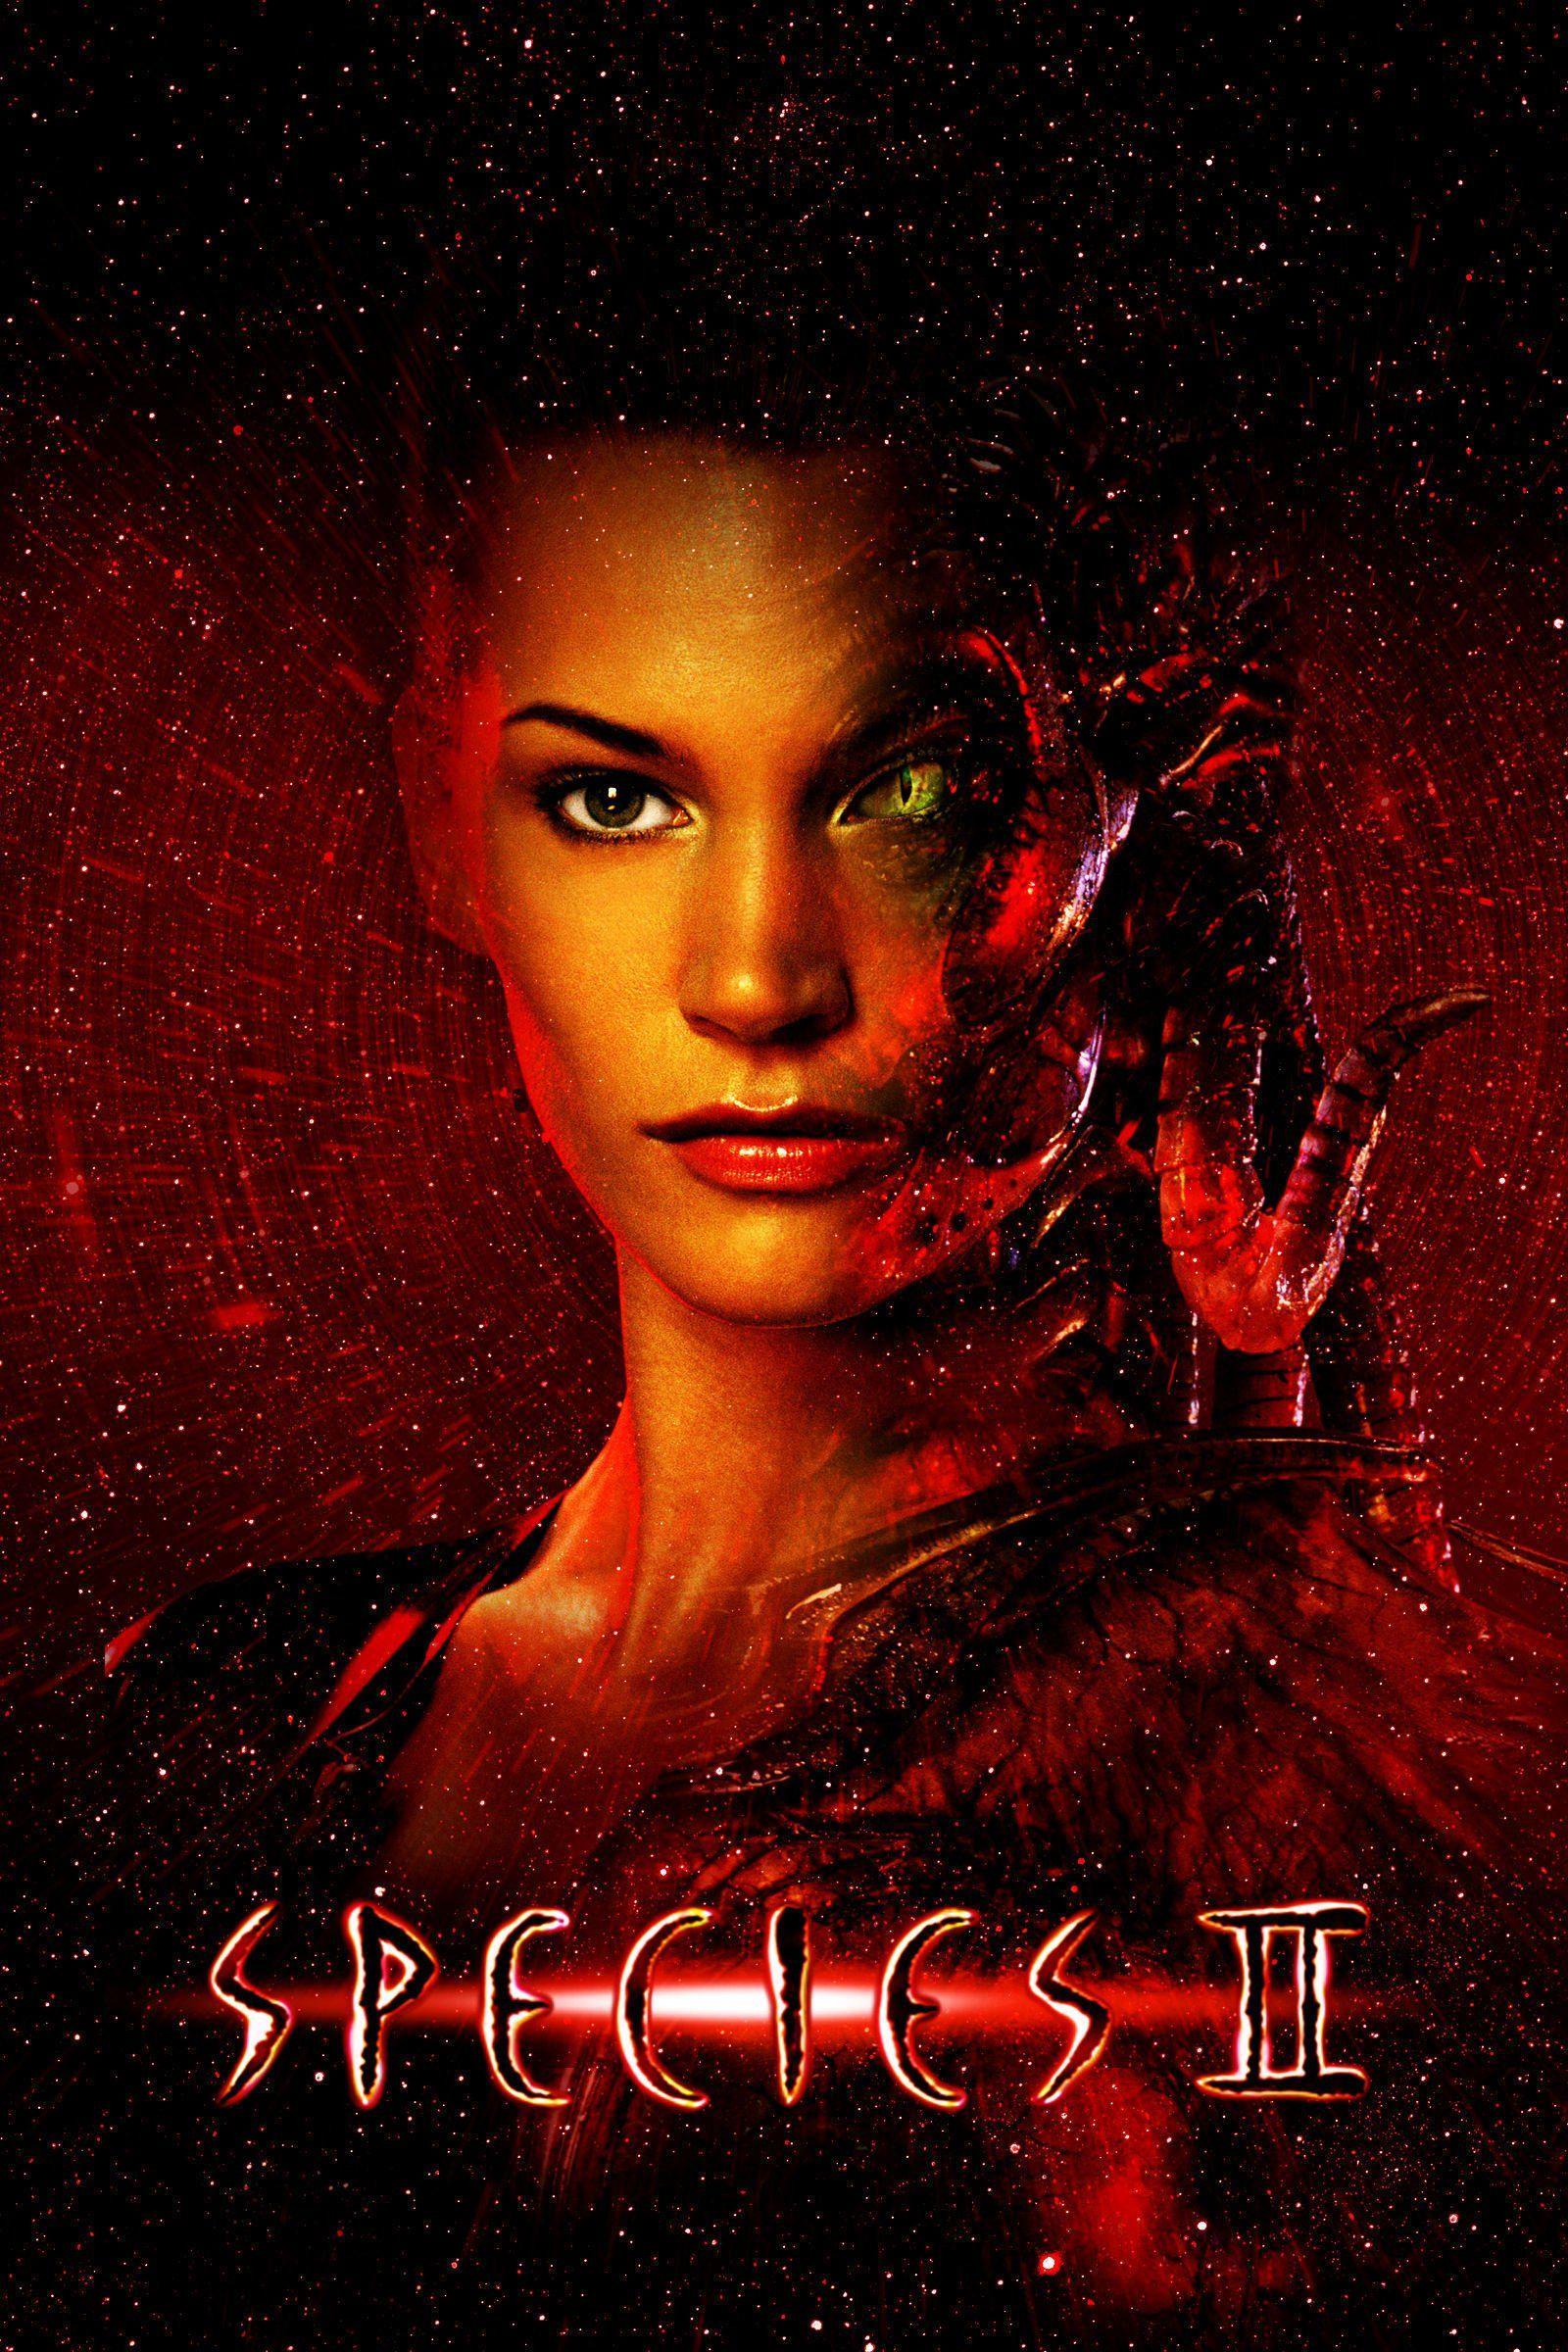 Species Ii 1998 Movie Species Ii Free Movies Online Species Film